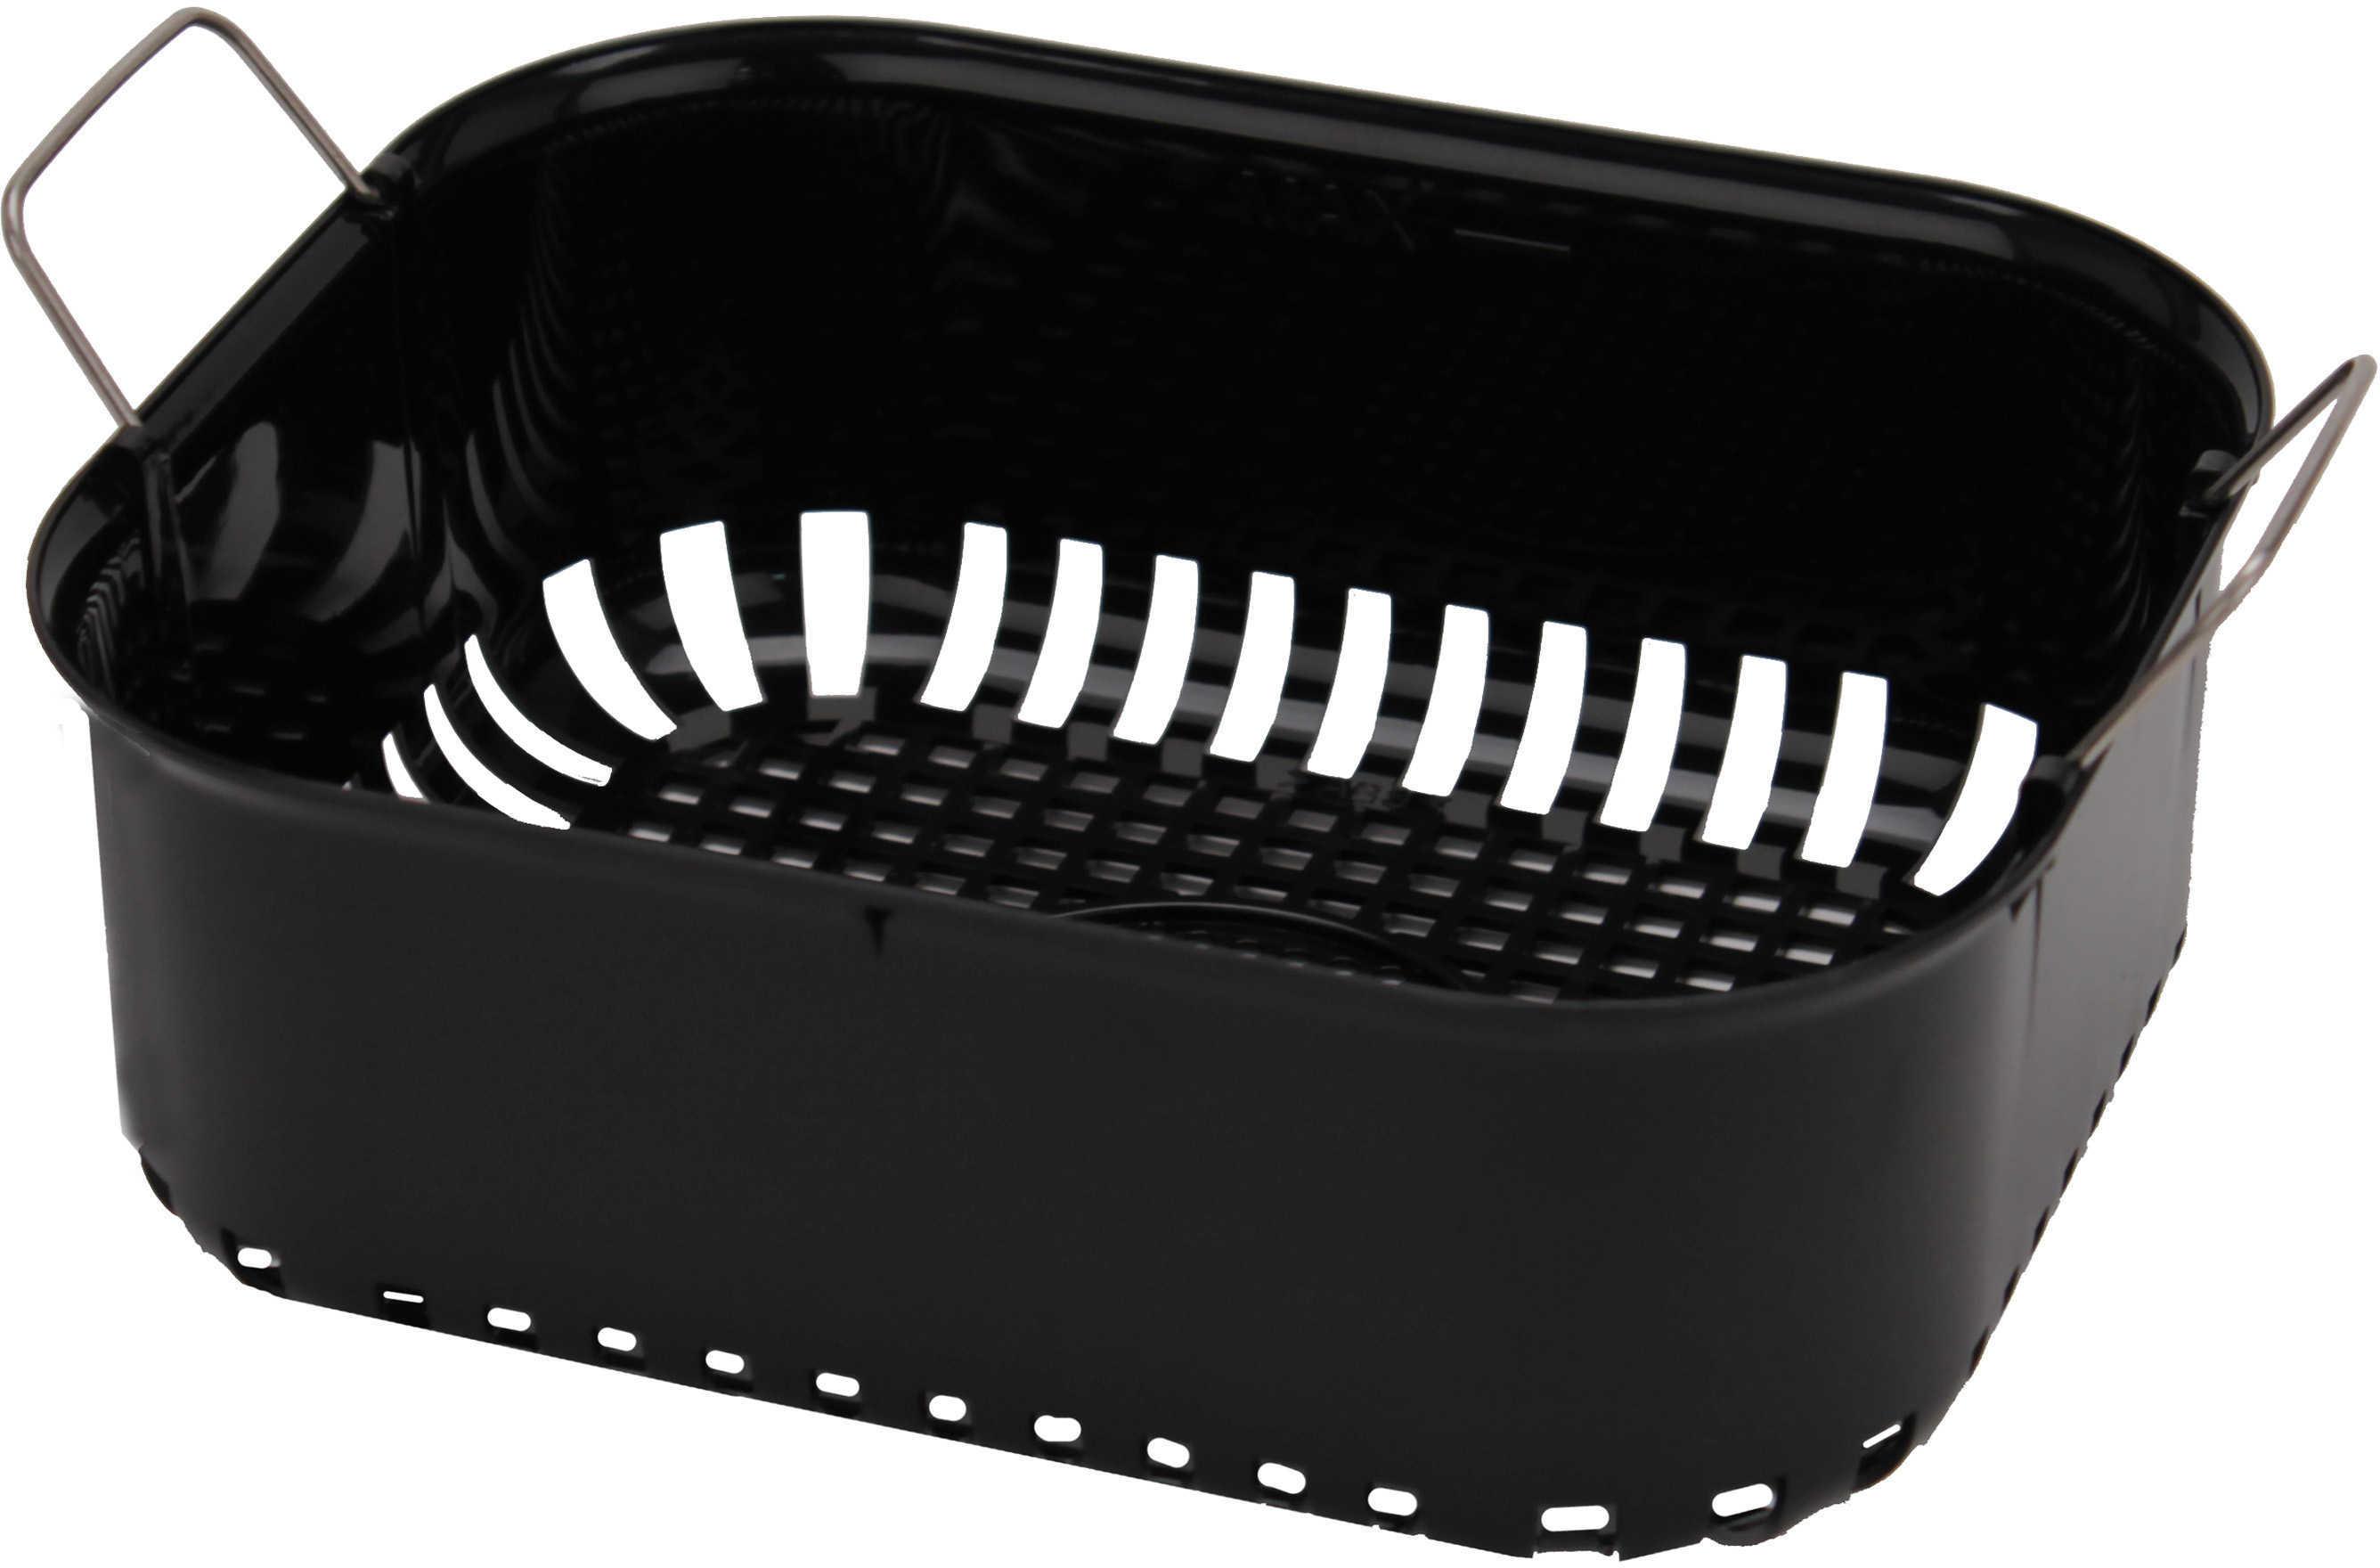 Hornady Lock N Load Sonic Cleaner Basket 1.2 Liter Md: 150204